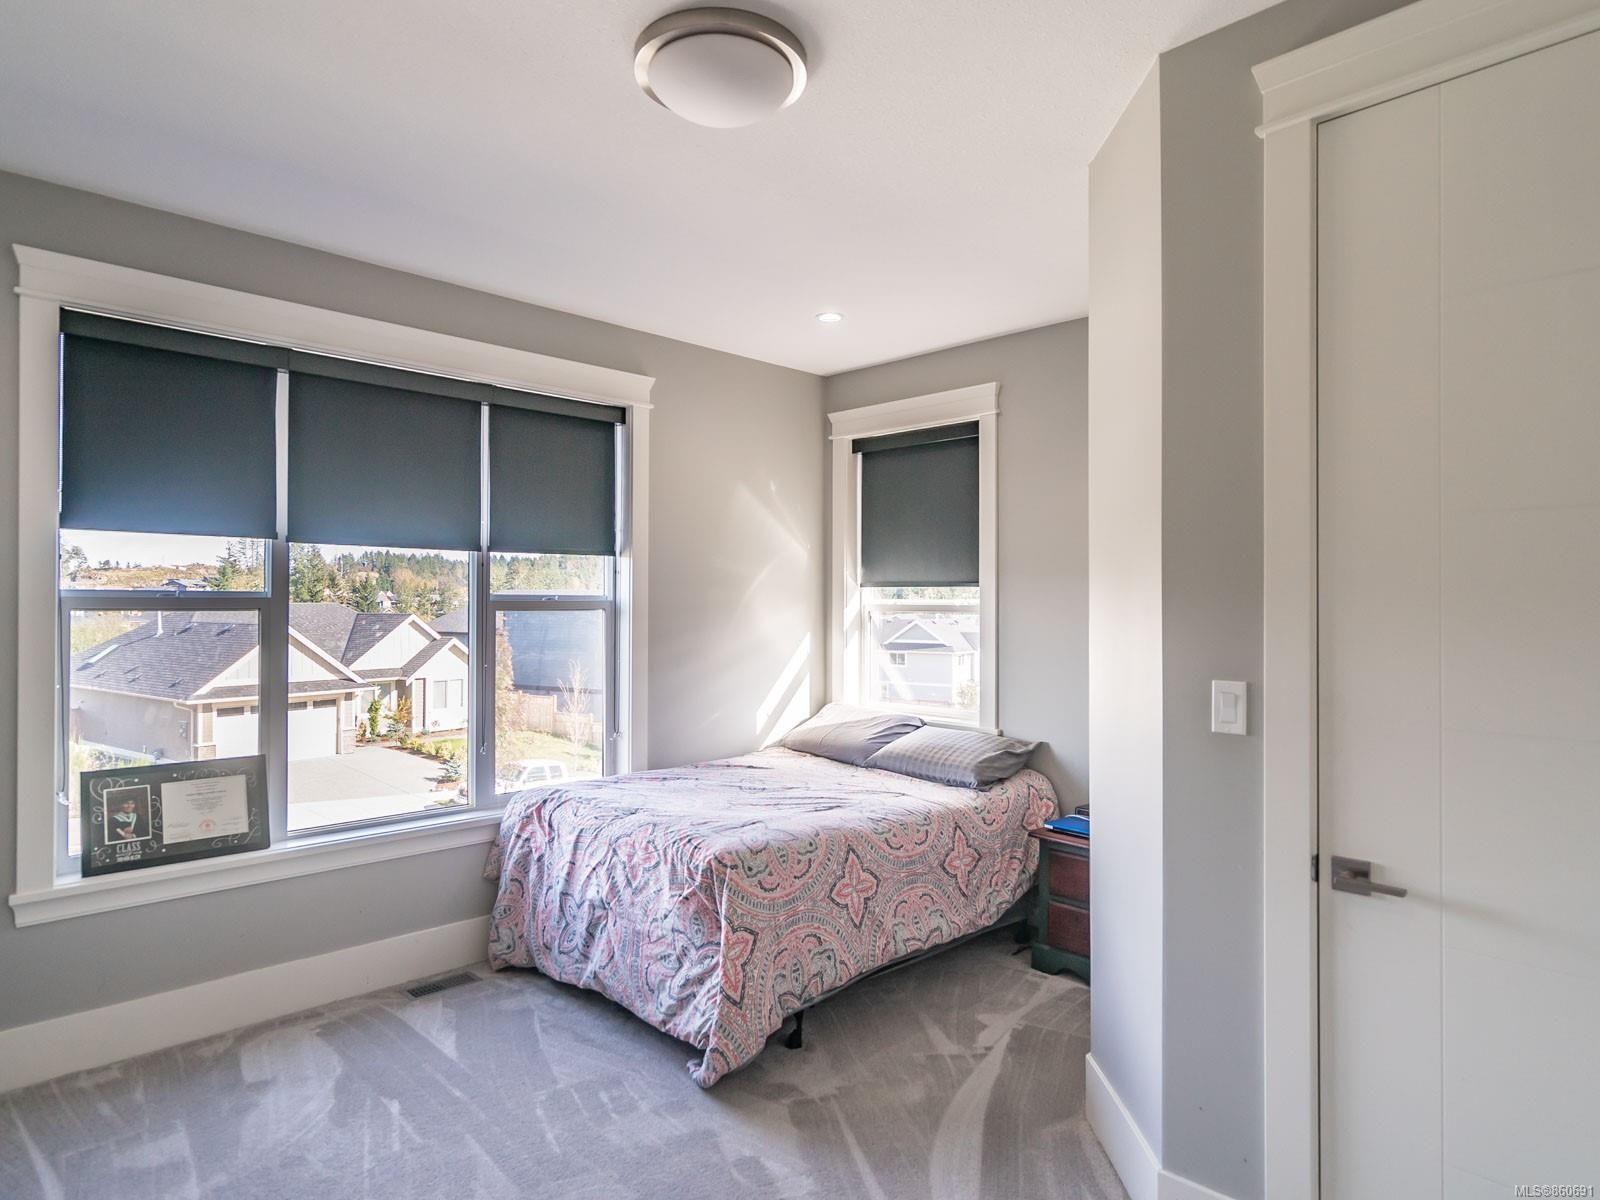 Photo 43: Photos: 5821 Linley Valley Dr in : Na North Nanaimo House for sale (Nanaimo)  : MLS®# 860691